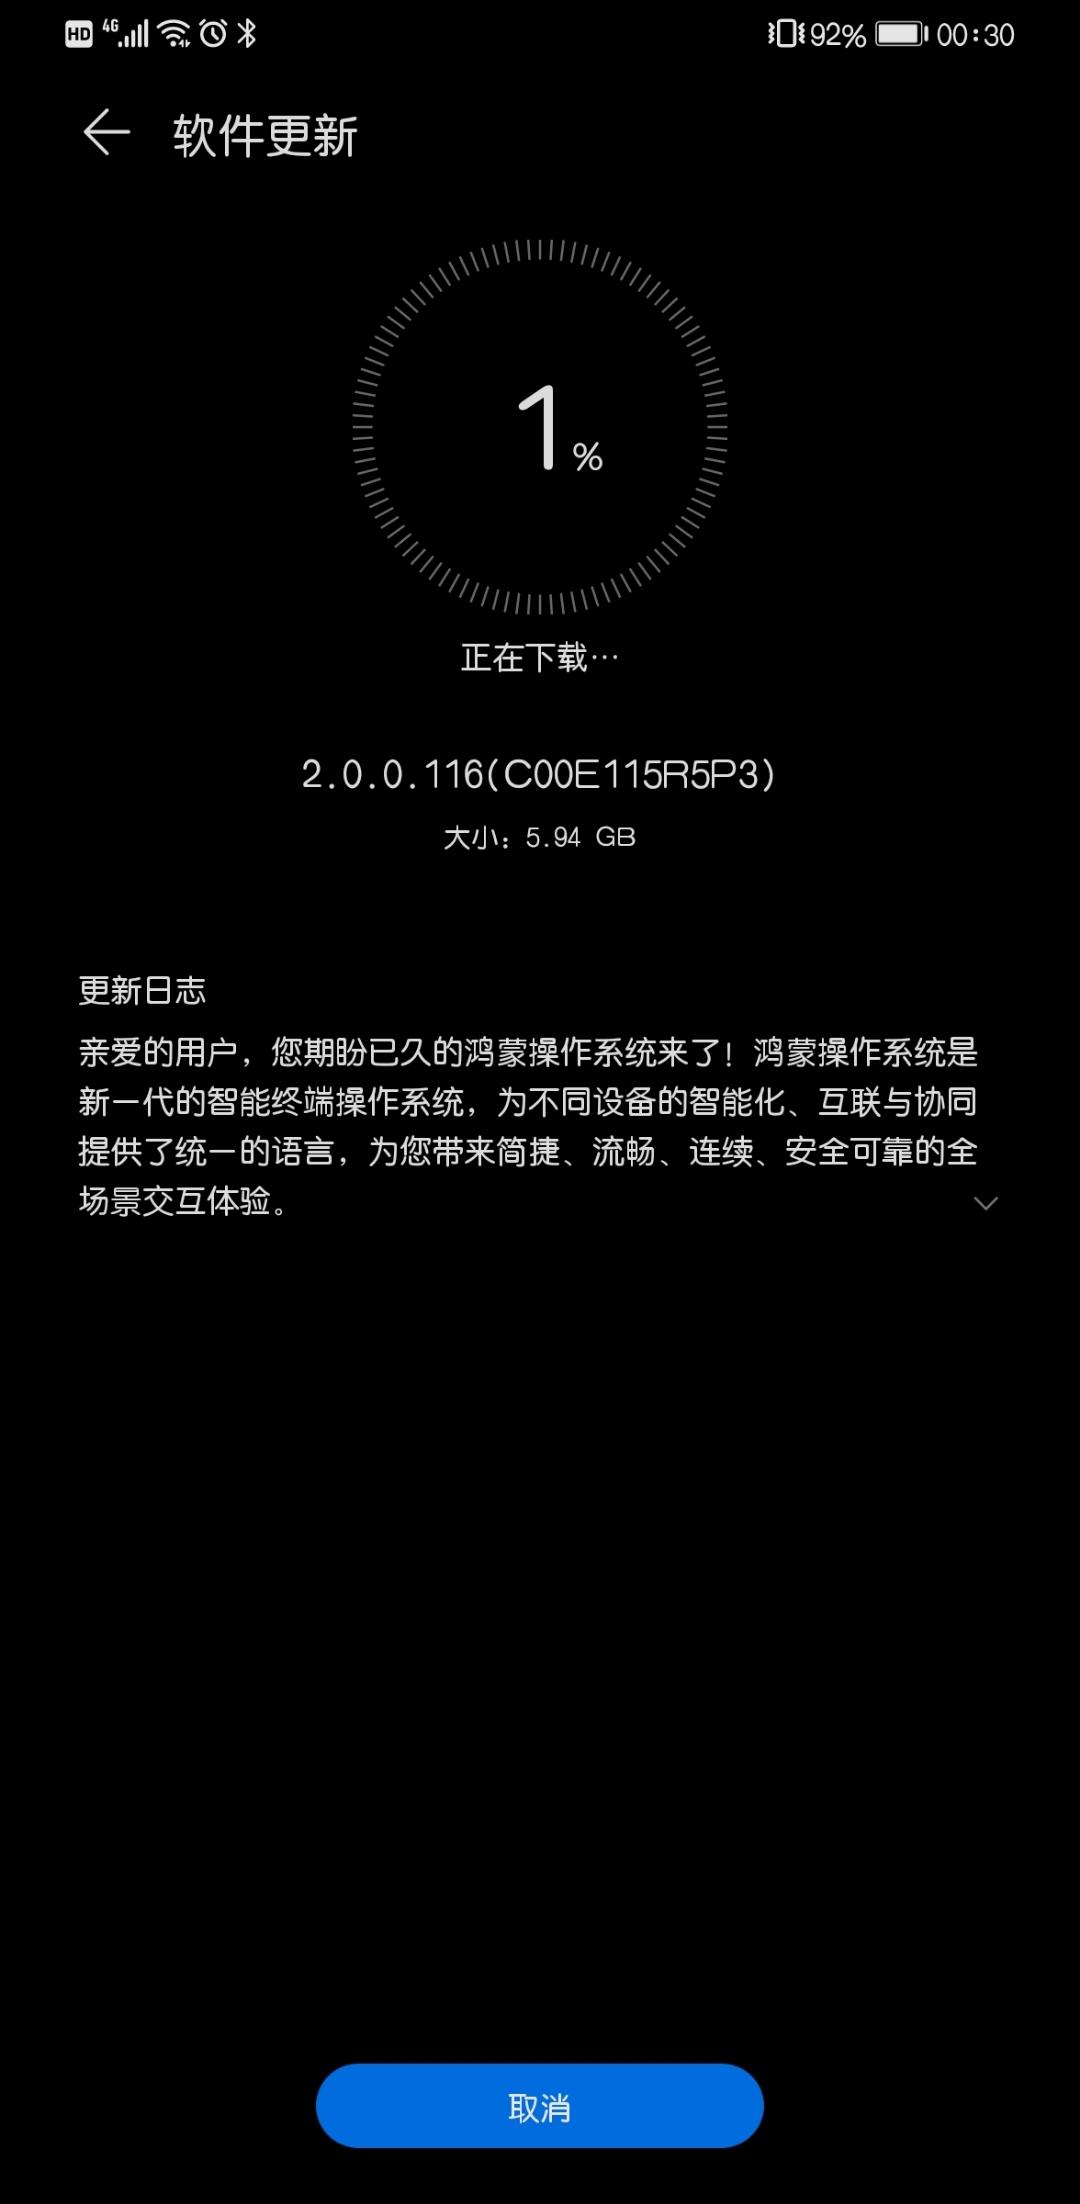 Screenshot_20210603_003043_com.huawei.android.hwouc.jpg